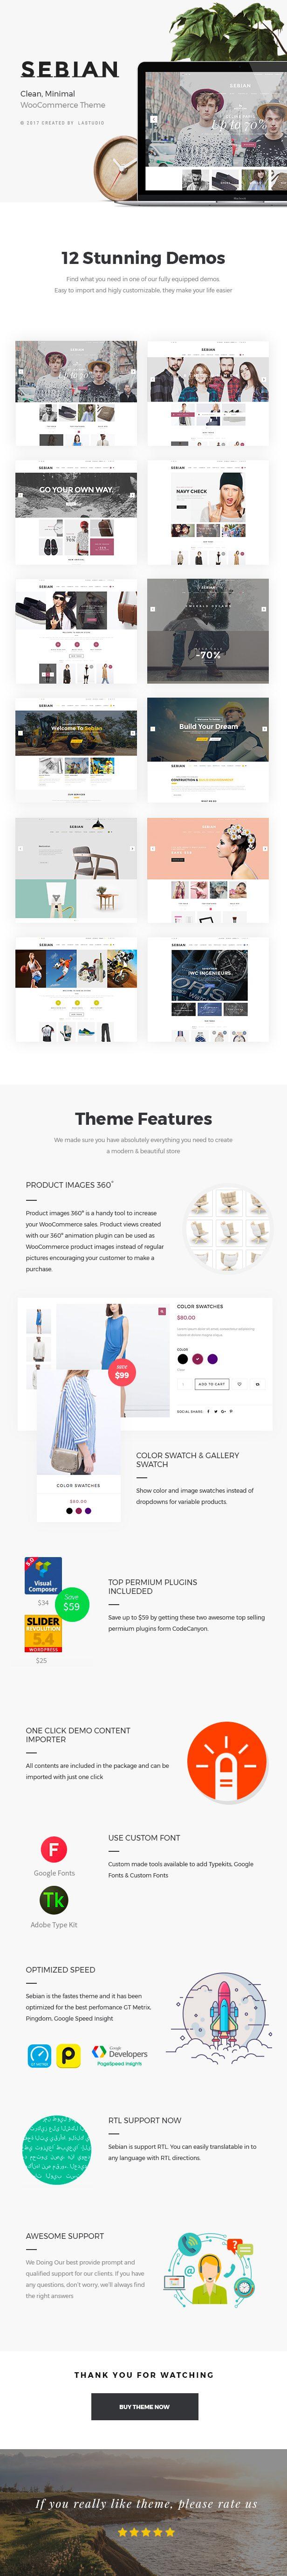 Sebian - Multi-purpose WordPress WooCommerce Theme - 1